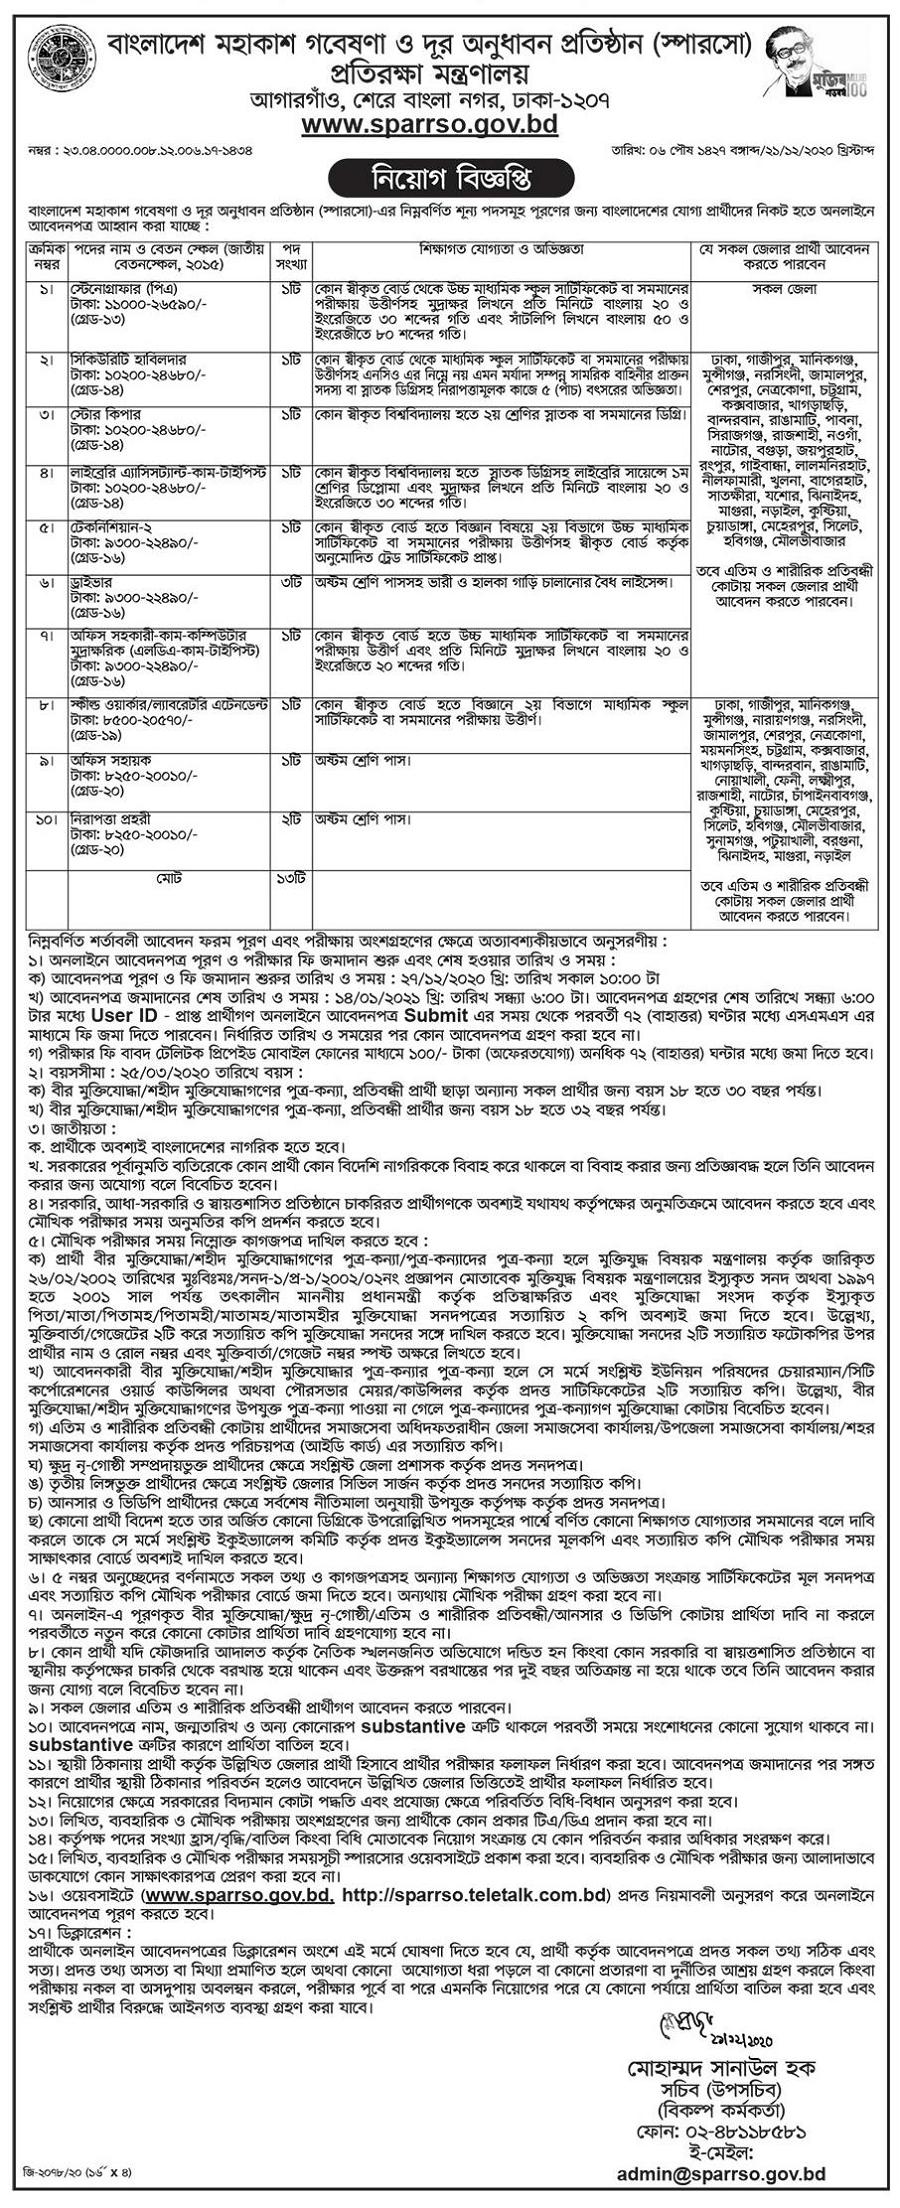 bangladesh-space-research-and-remote-sensing-organization-sparrso-job-circular-2020